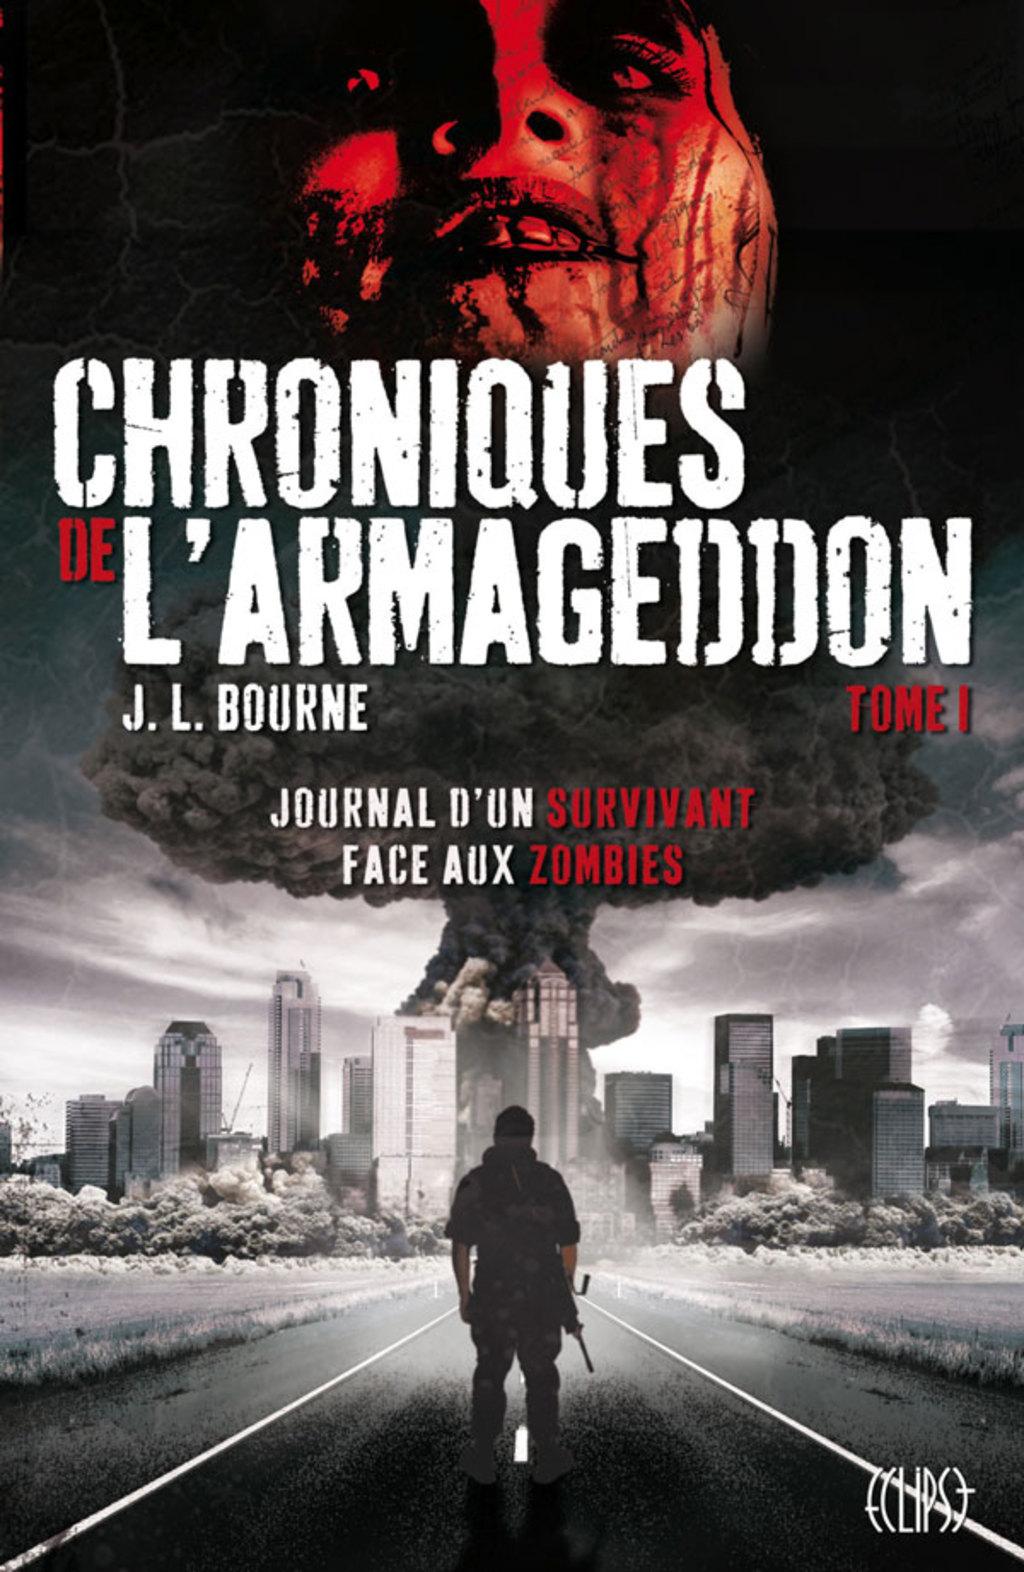 Chroniques de l'Armageddon T01 (ebook) eBooks